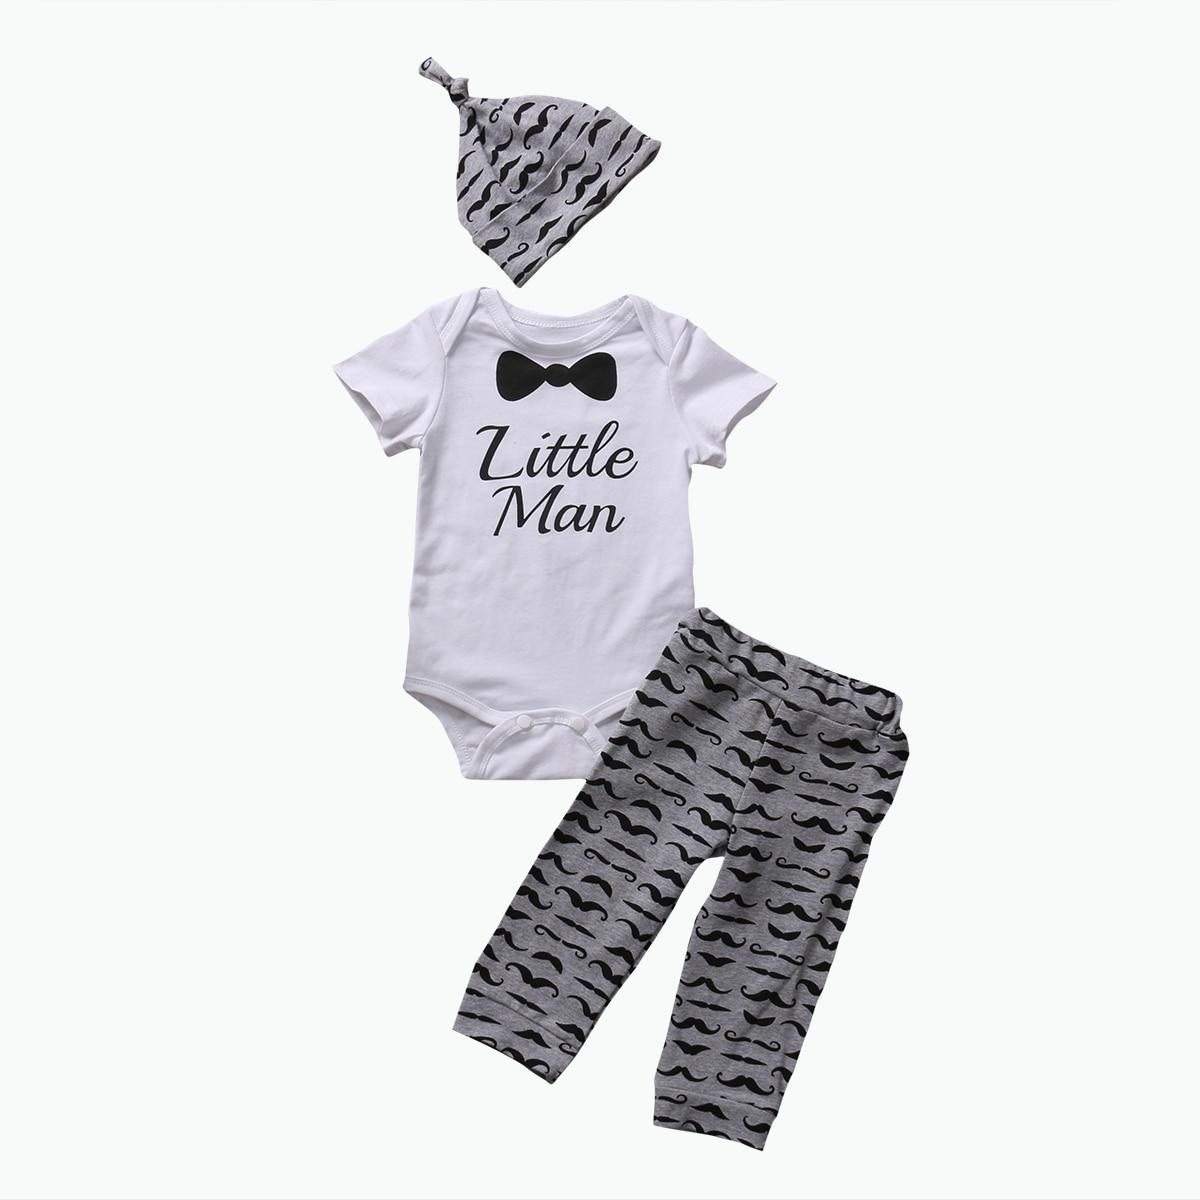 2017 New Arrivals Baby Boys Gentleman Short Sleeve Romper+Long Pant+Hat 3pcs Summer Cotton Cute Sunsuits Casual Baby Sets